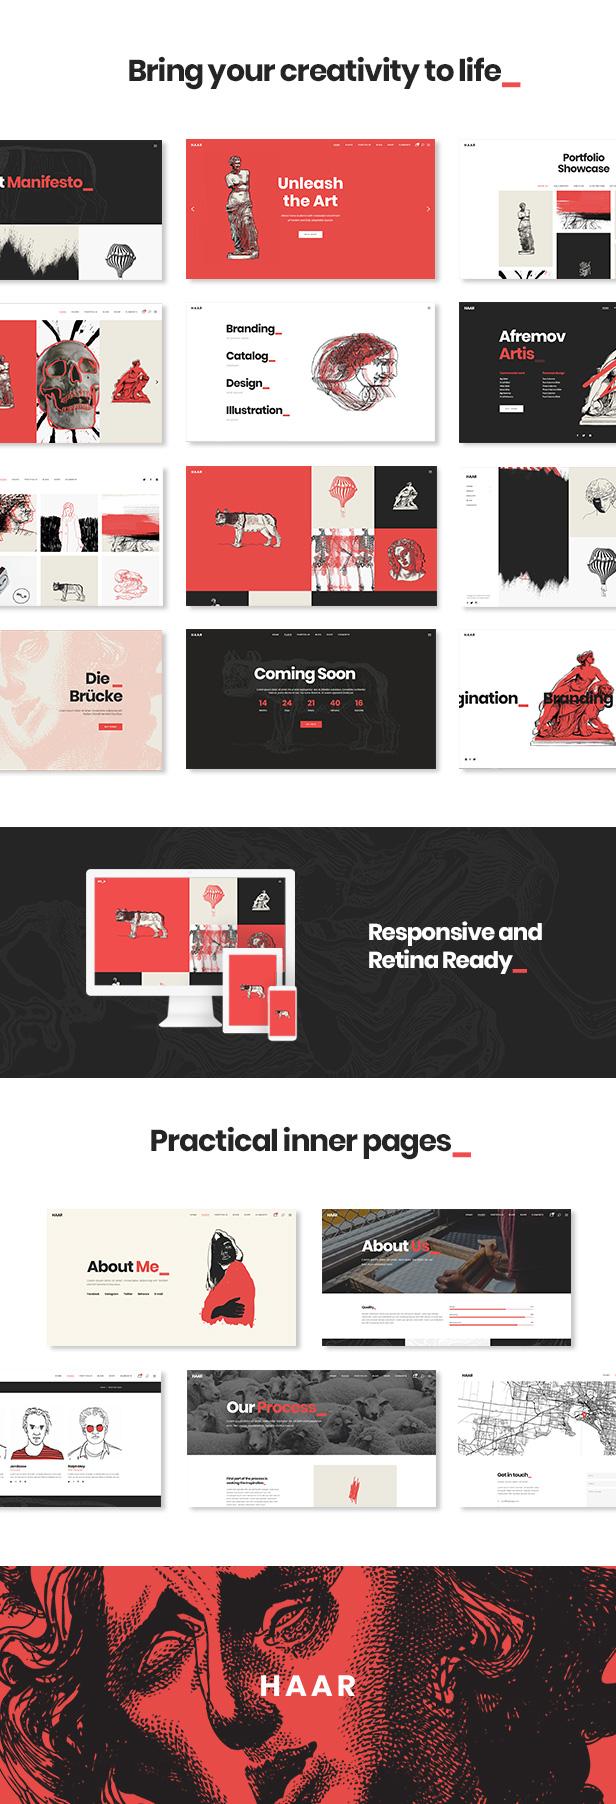 02 - Haar - Portfolio Theme for Designers, Artists and Illustrators